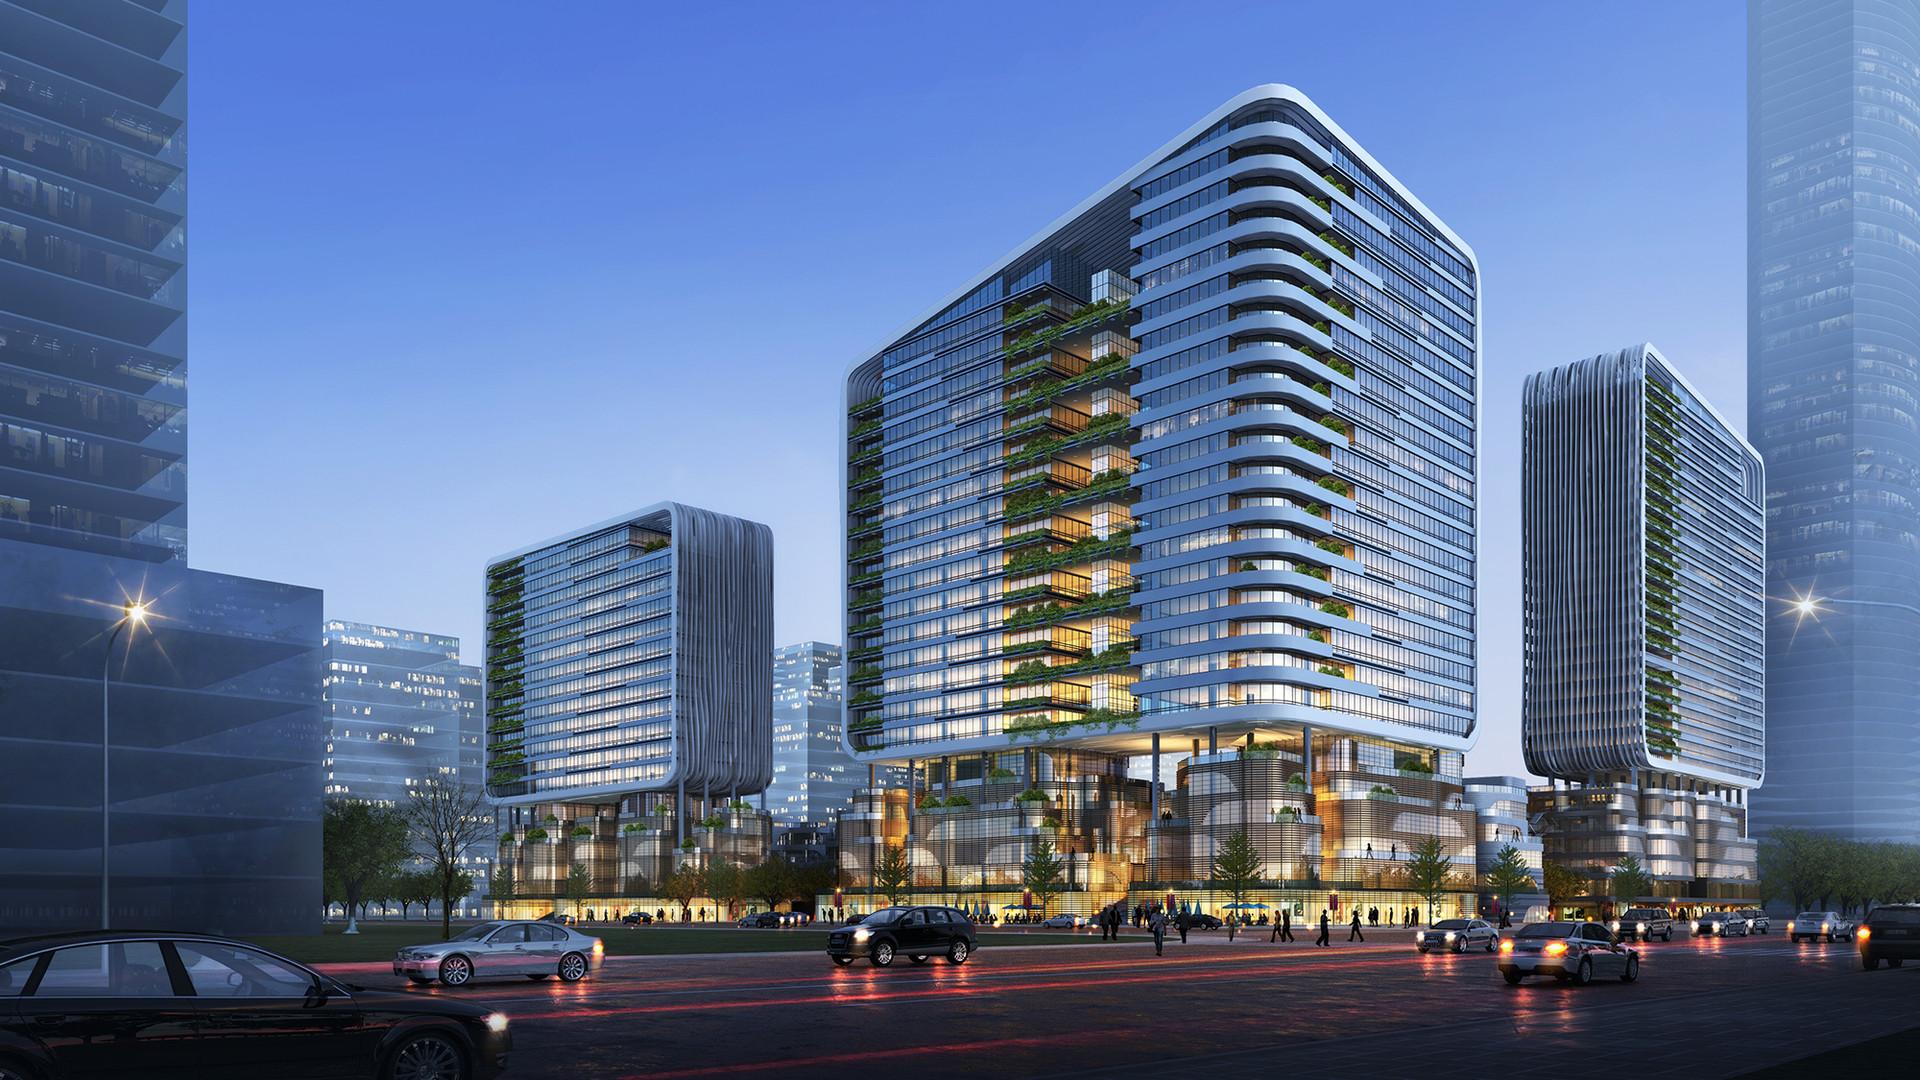 suzhou greenland centre